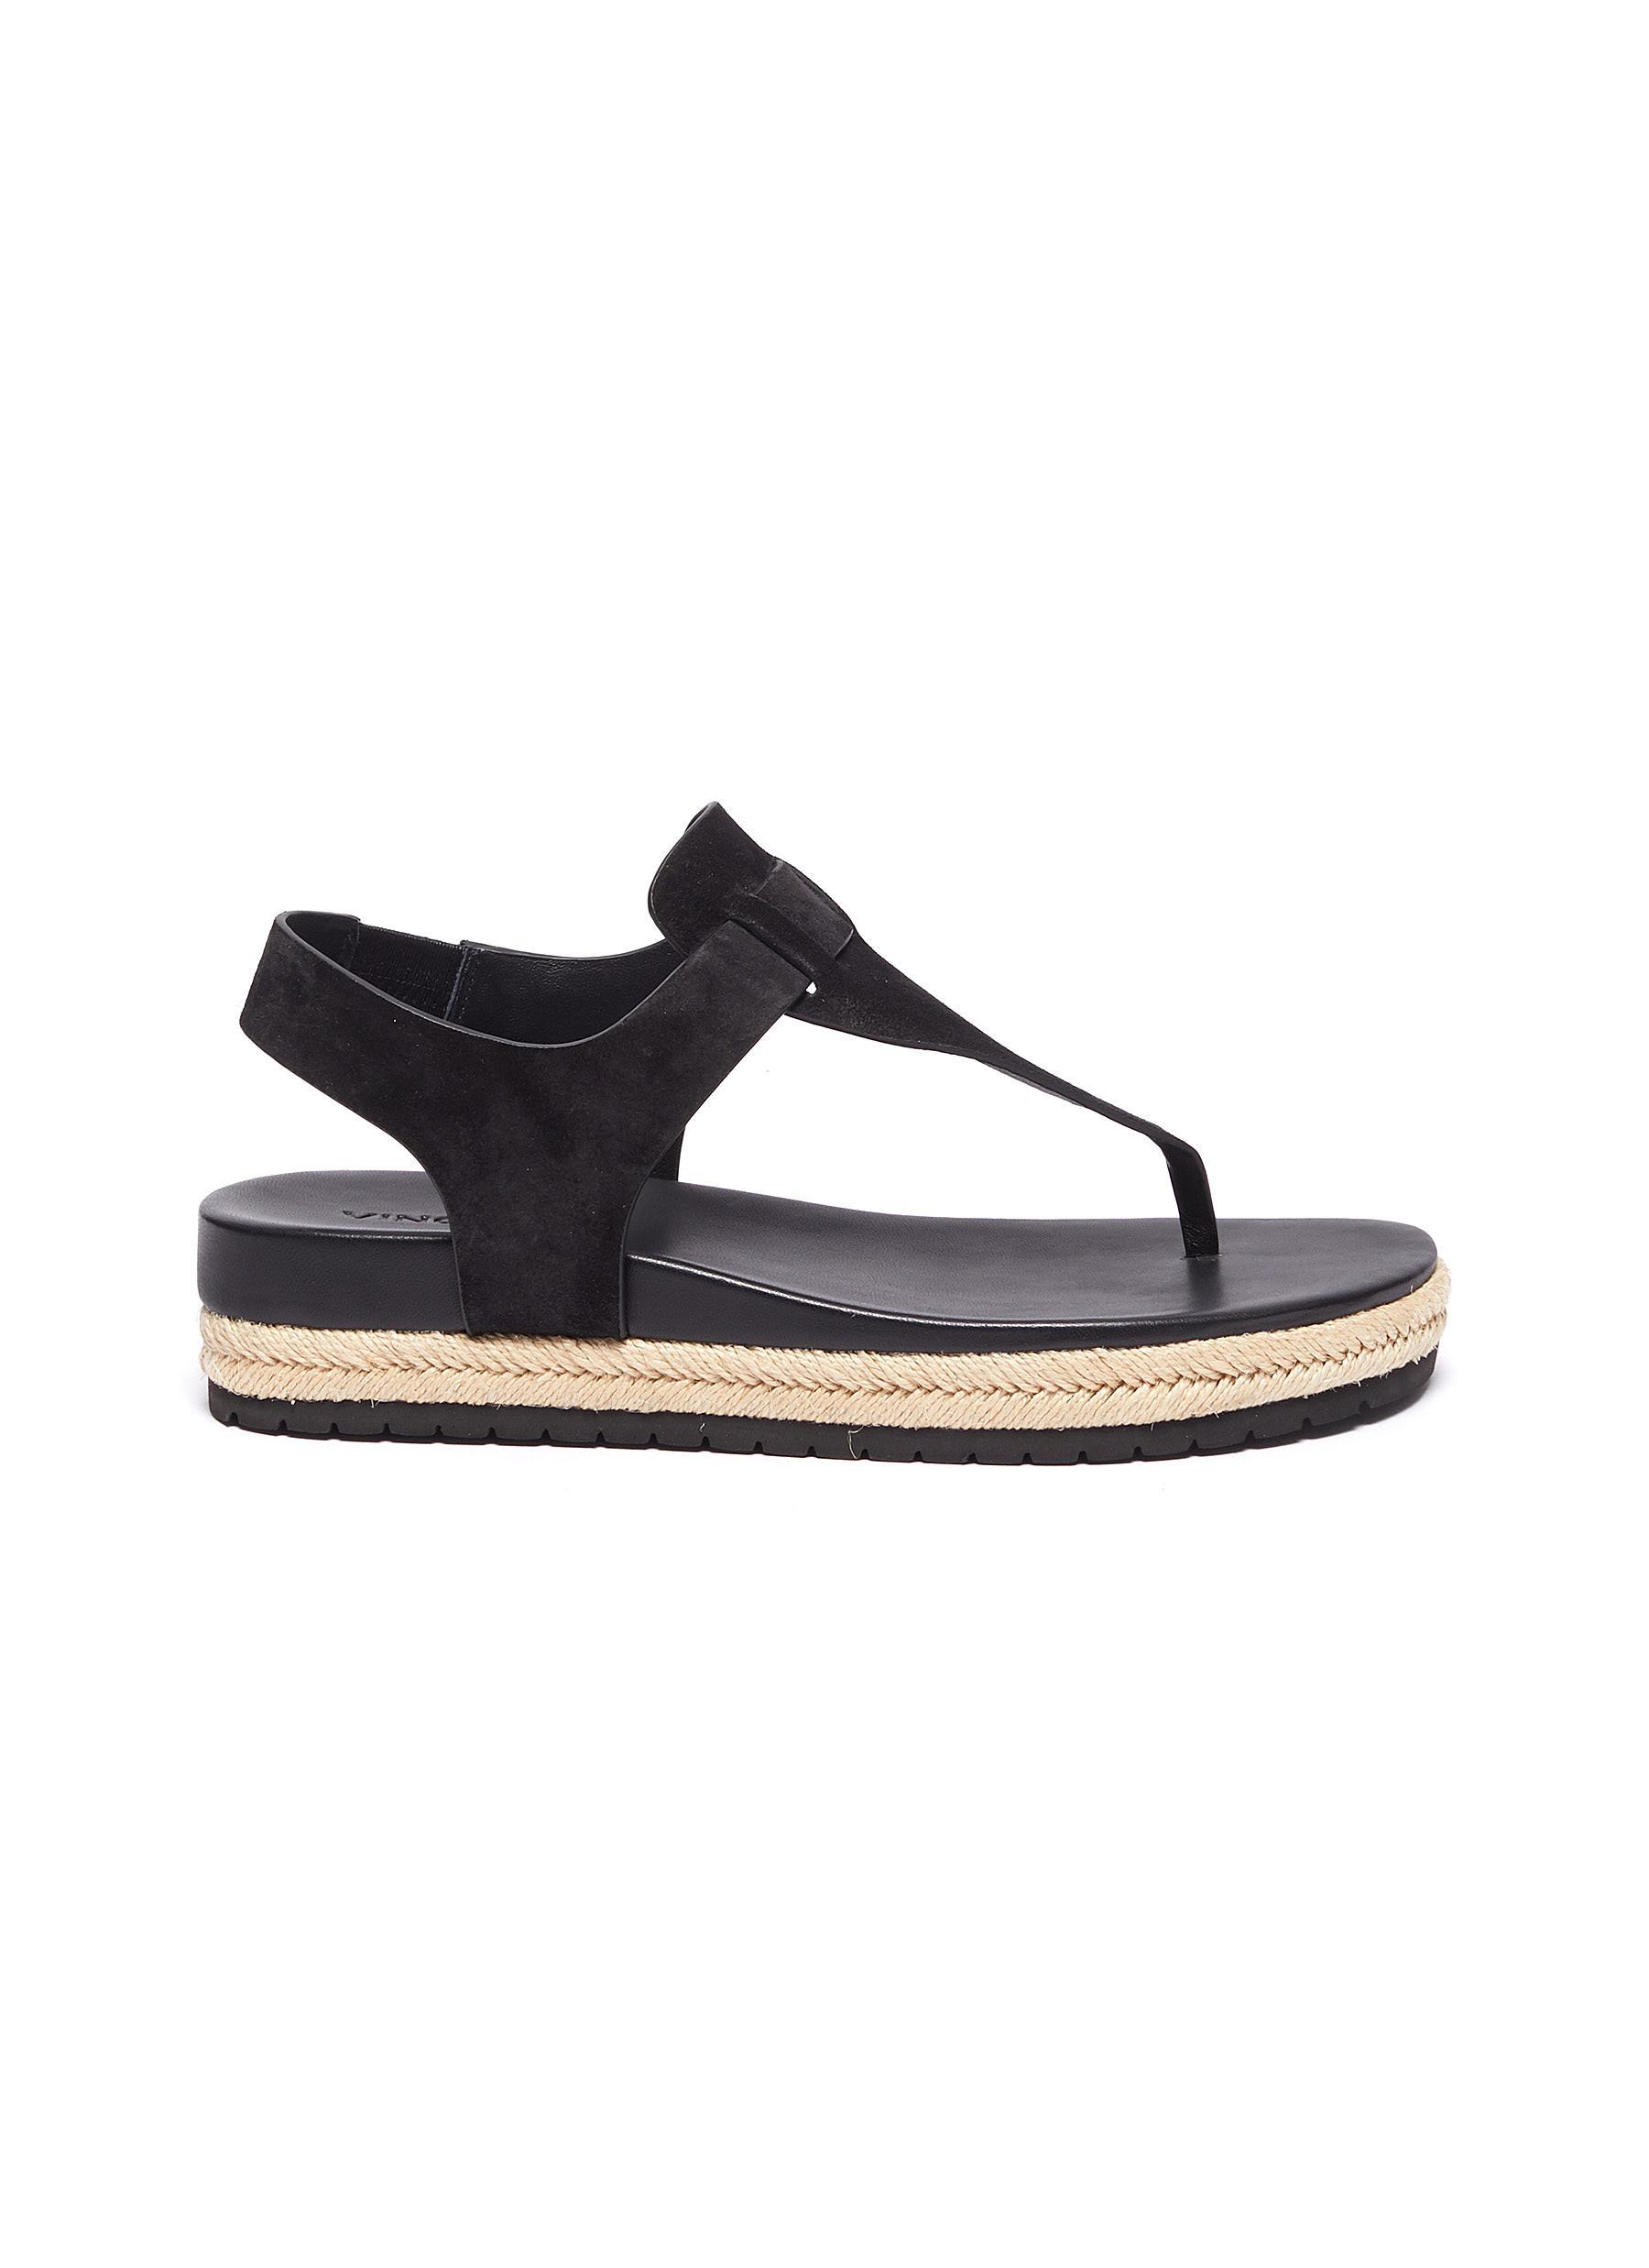 shop Vince 'Flint' T-Bar suede espadrille sandals online